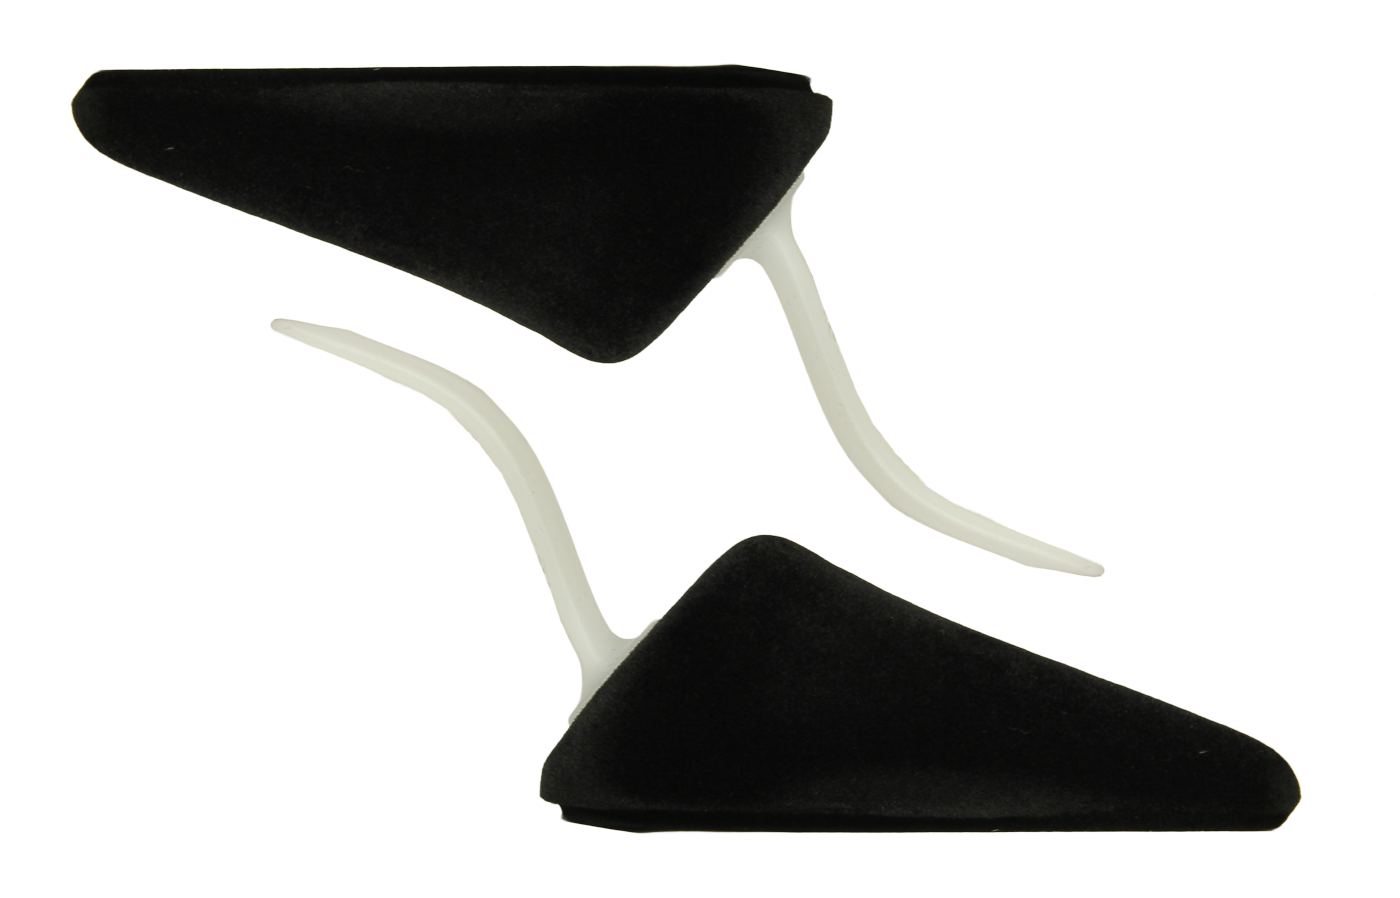 embauchoir chaussures femmes pas cher. Black Bedroom Furniture Sets. Home Design Ideas